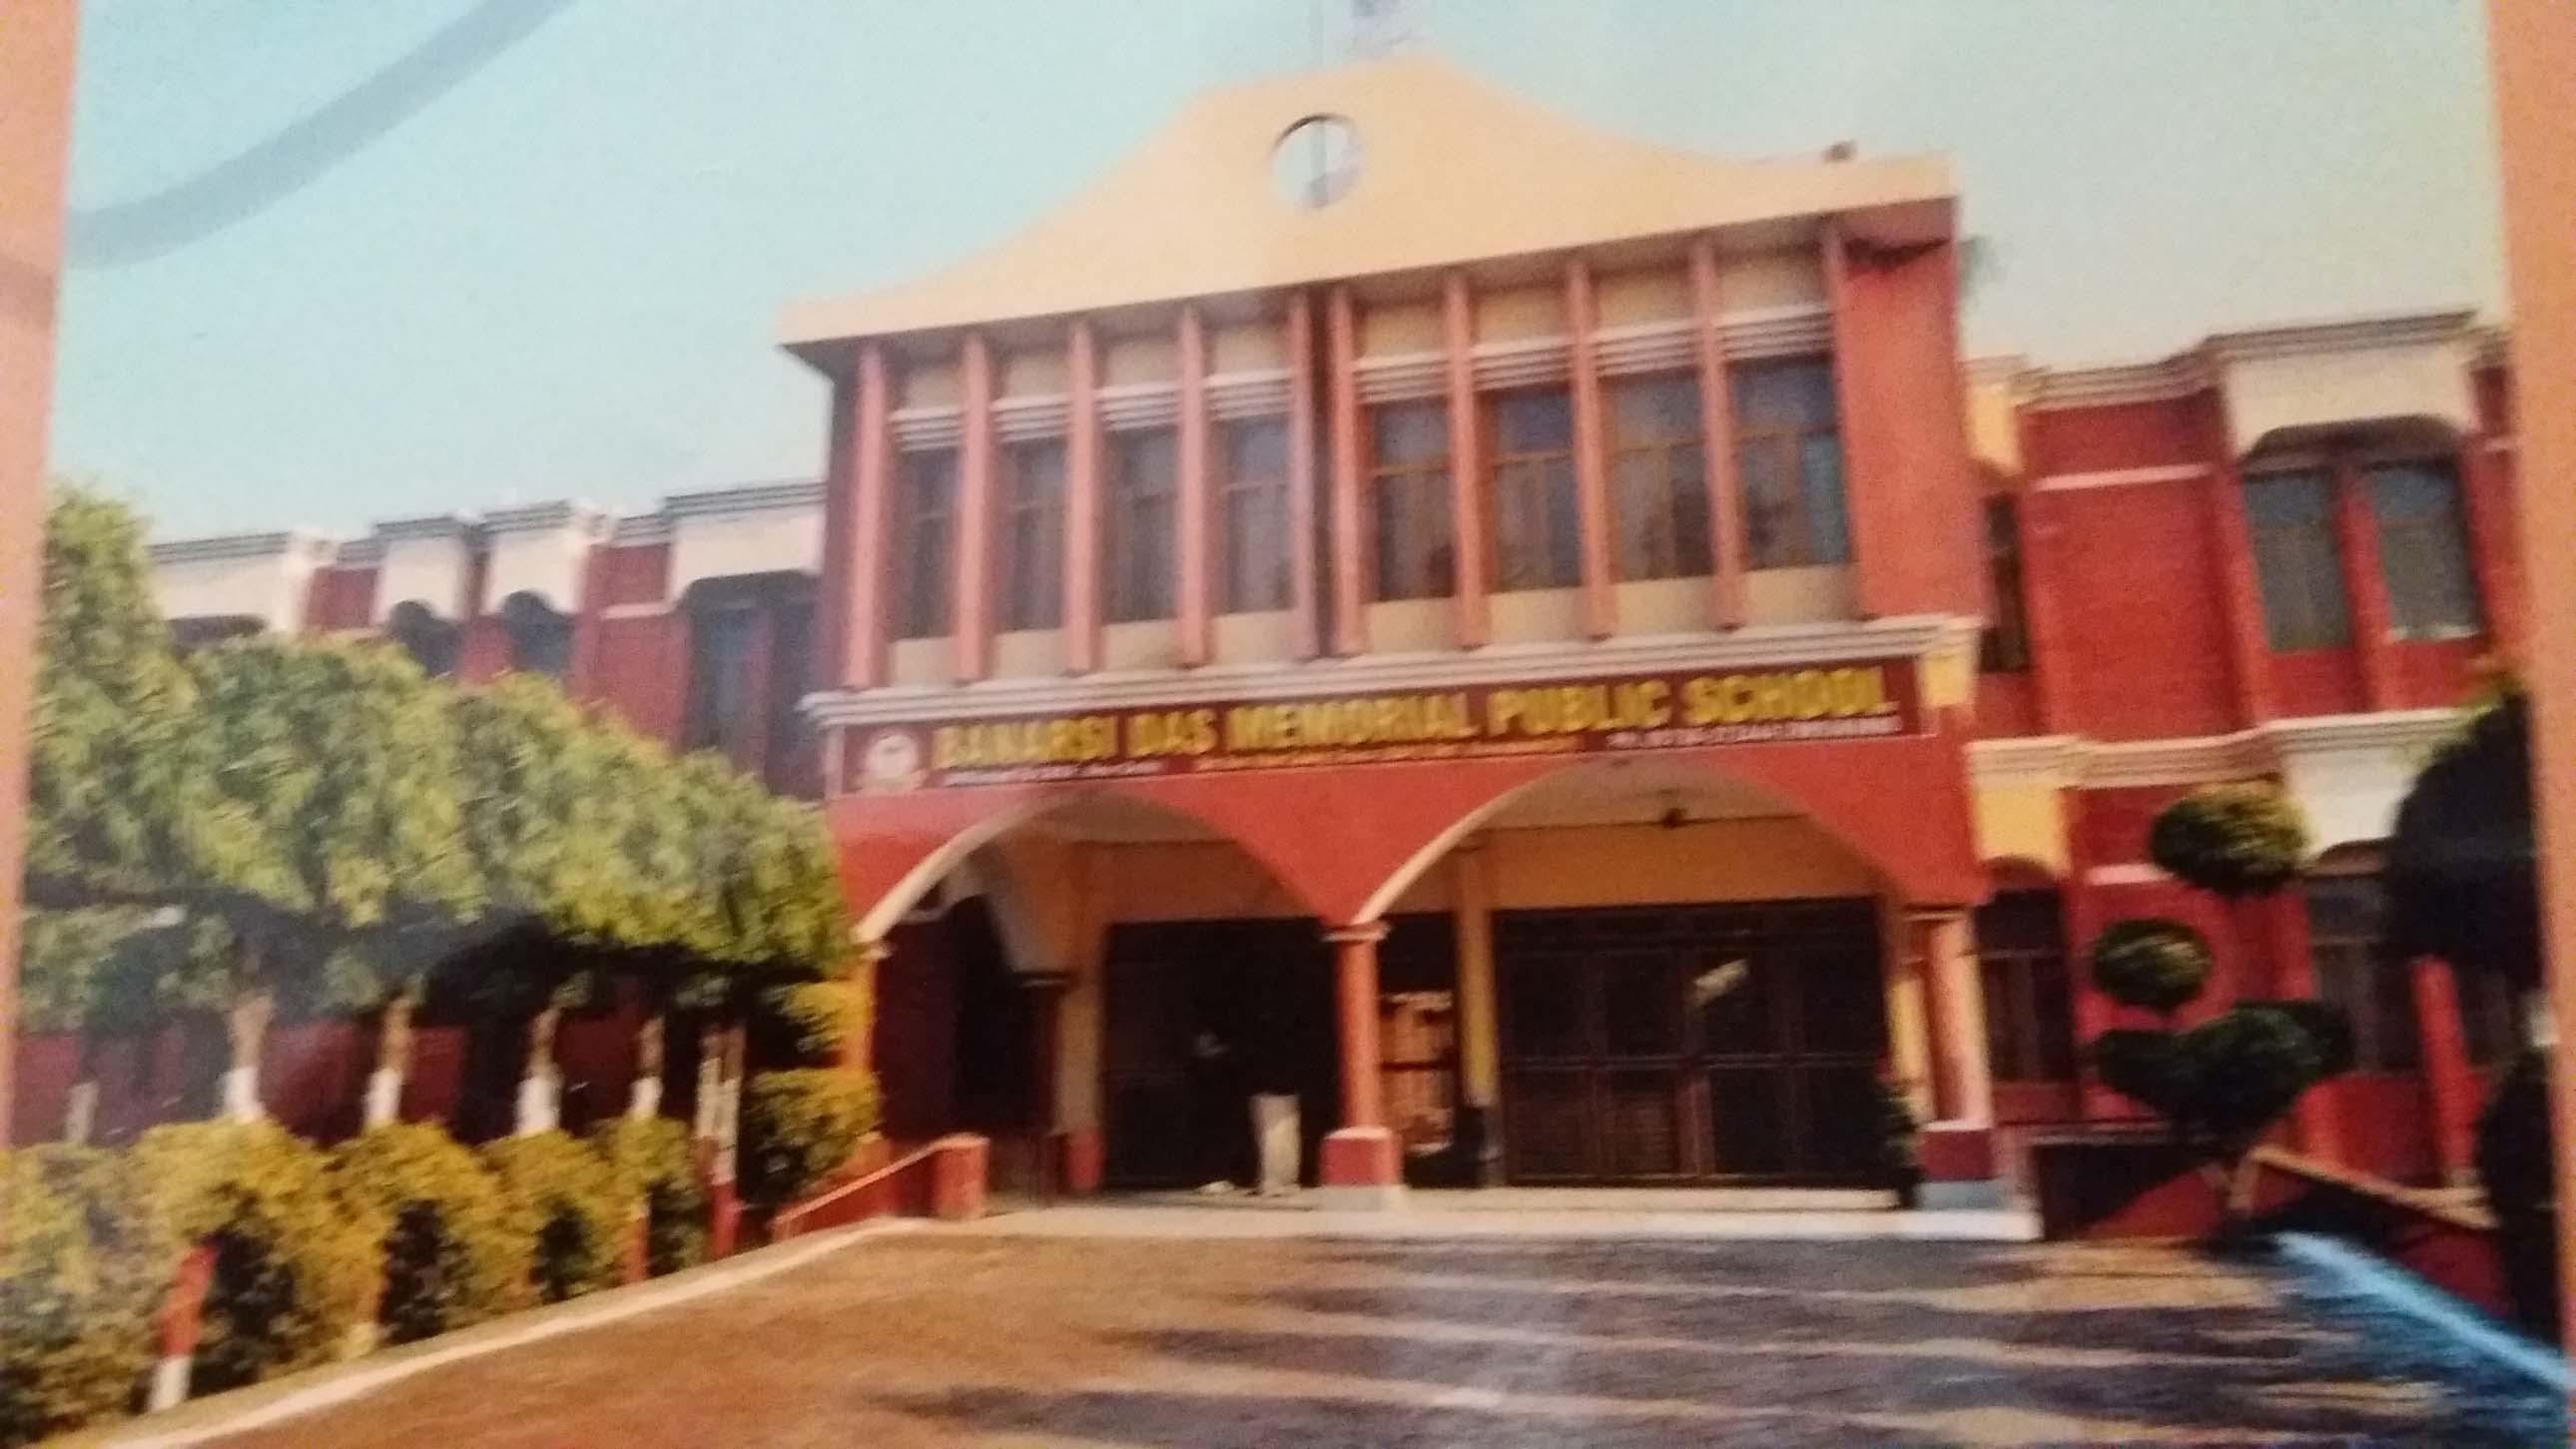 BANARSI DAS MEMORIAL PUBLIC SCHOOL SHRI RAM VIHAR COLONY 2130897